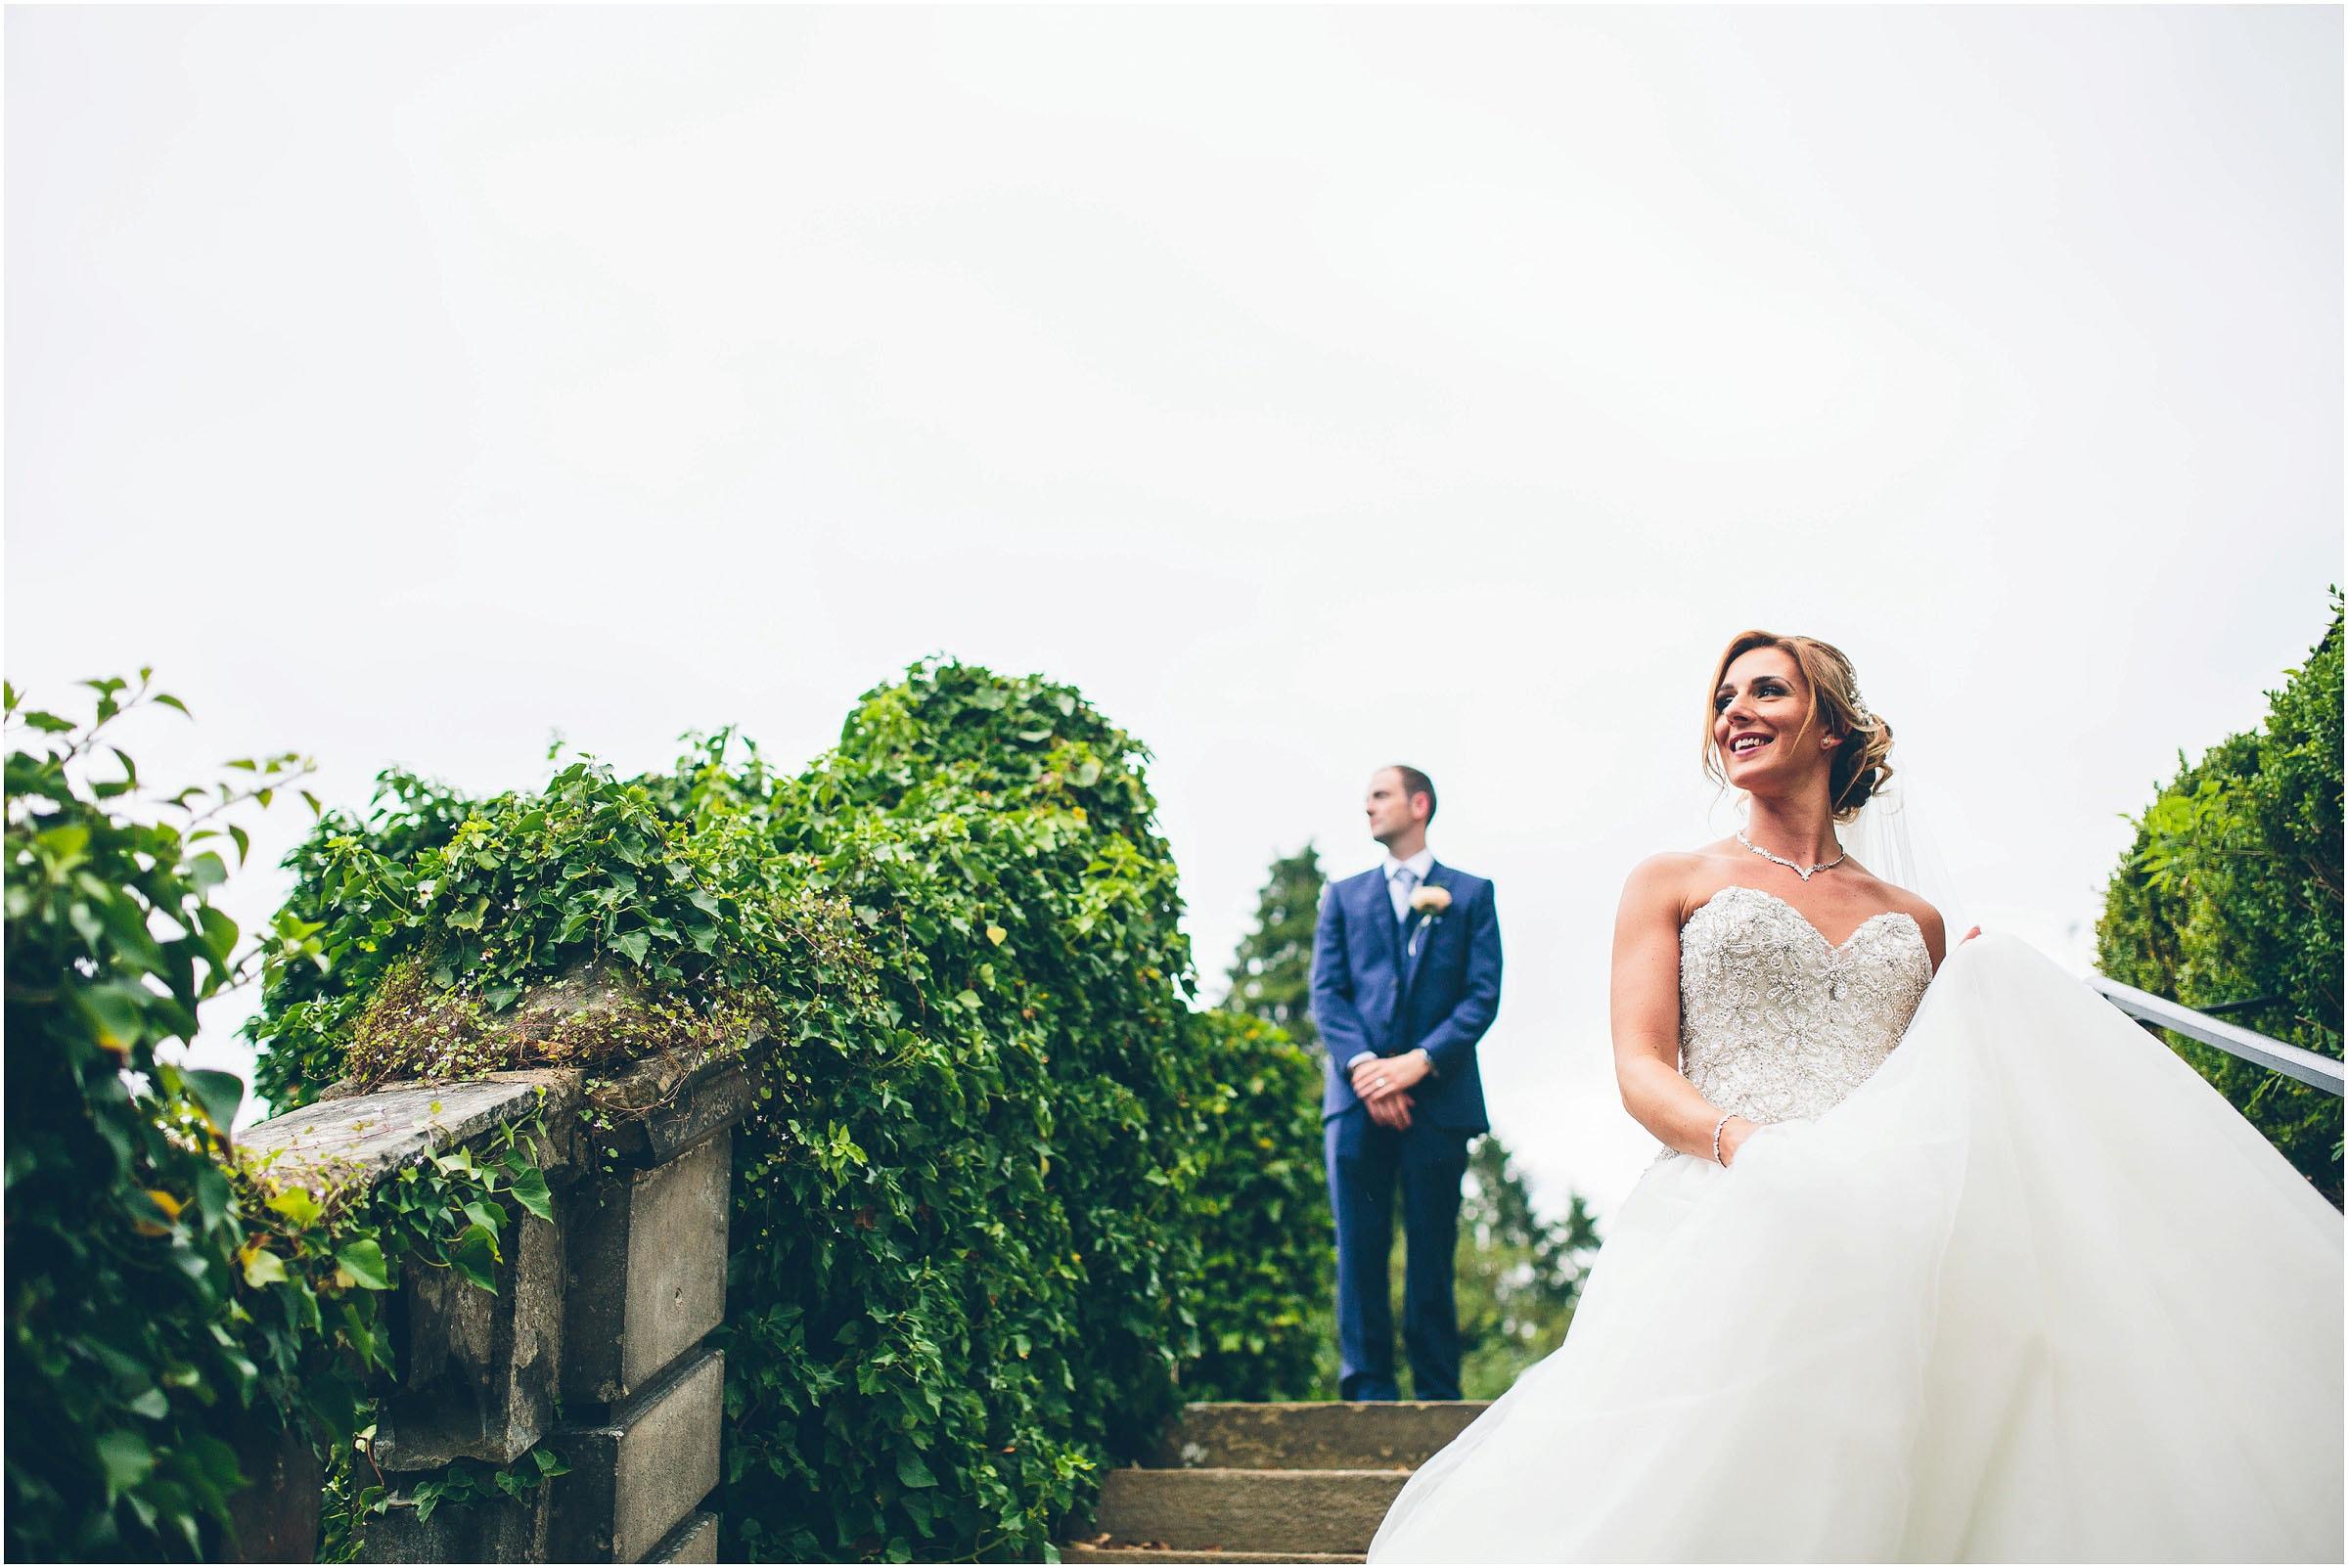 Mitton_Hall_Wedding_Photography_0099